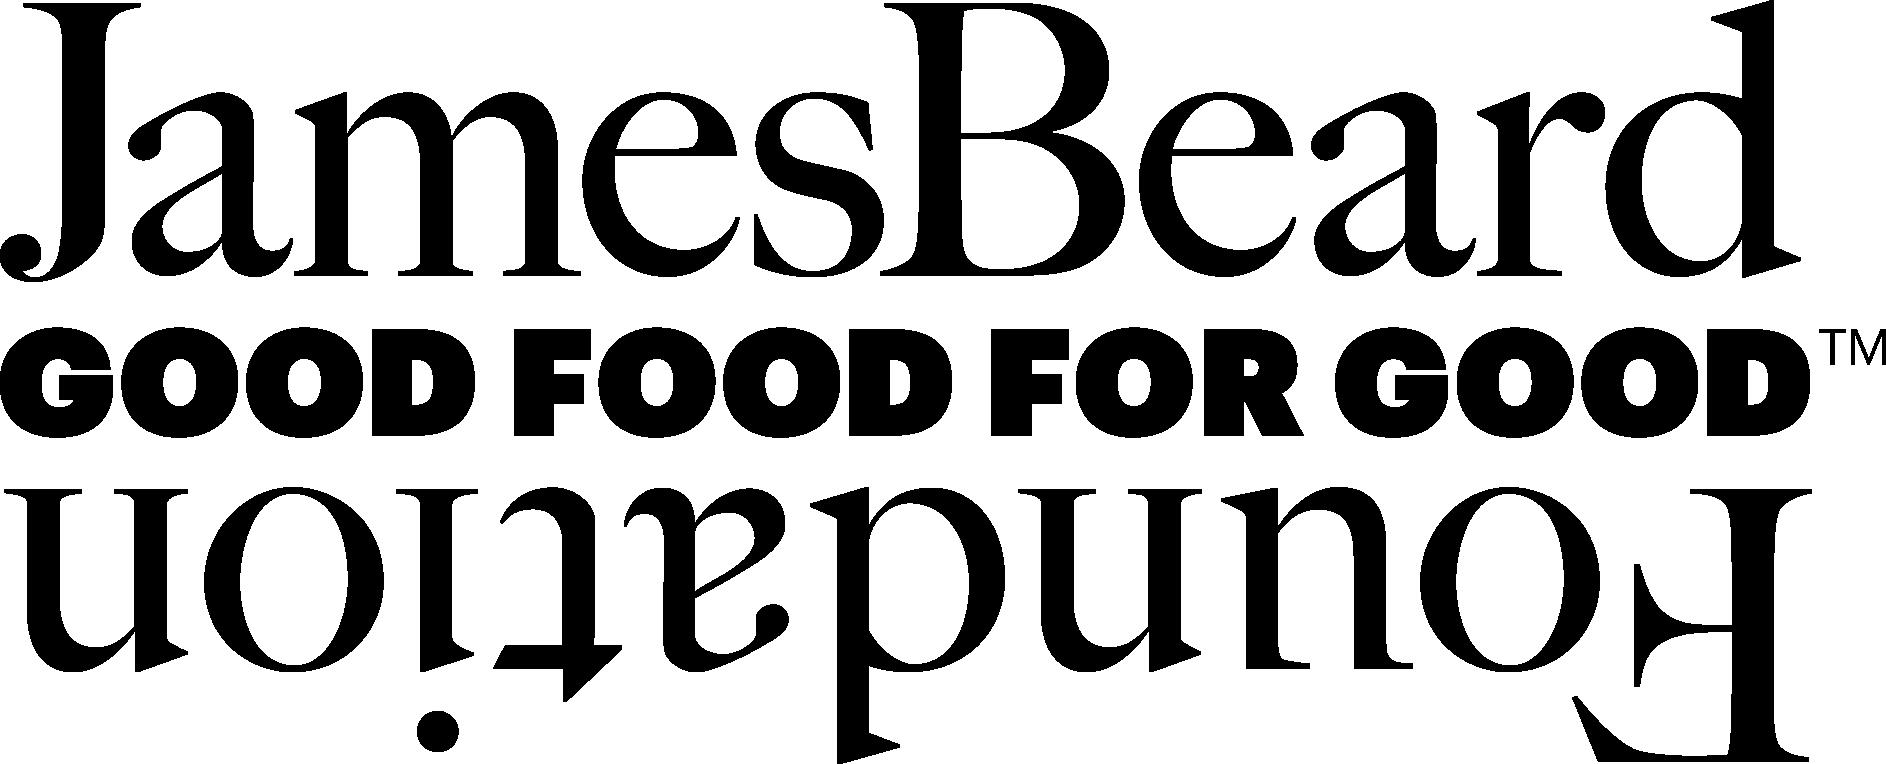 Logo for James Beard Foundation Good Food for Good